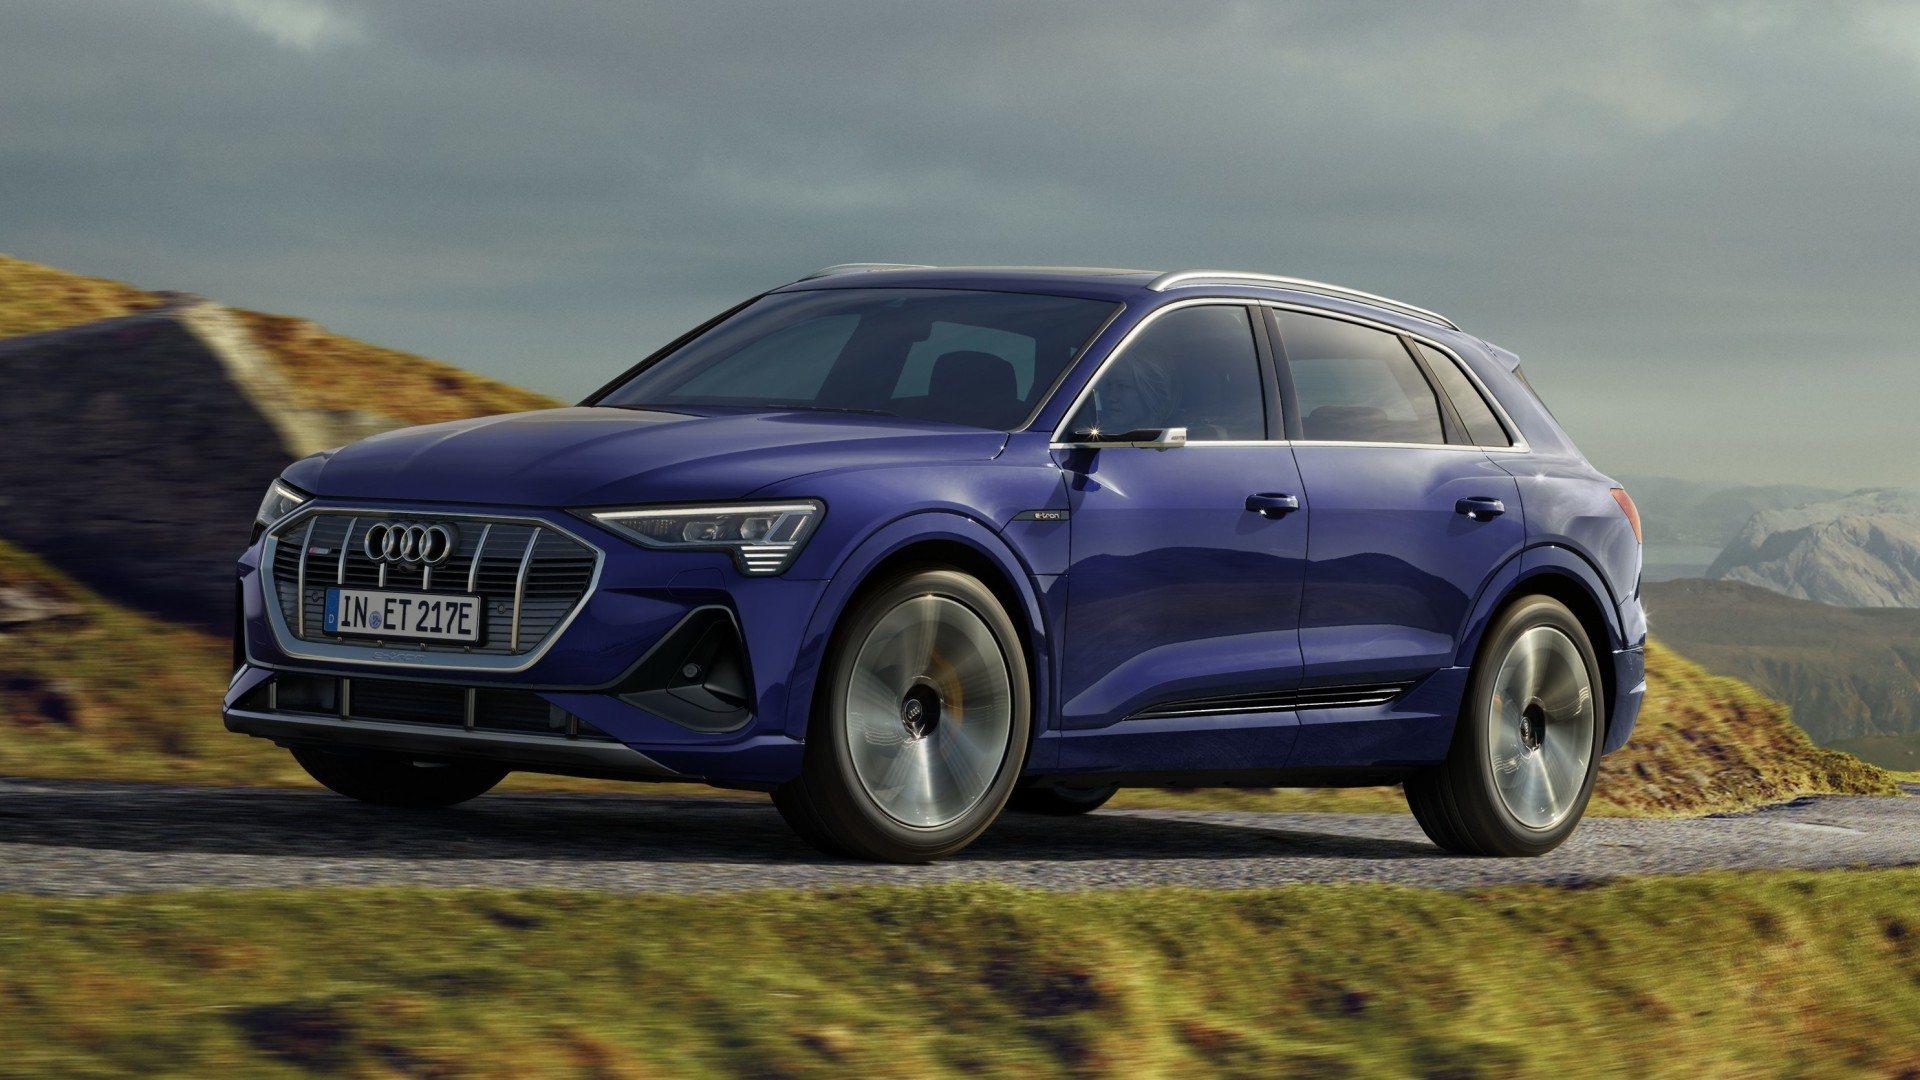 Audi e-tron 2020: ahora más eficiente con 436 kilómetros de autonomía